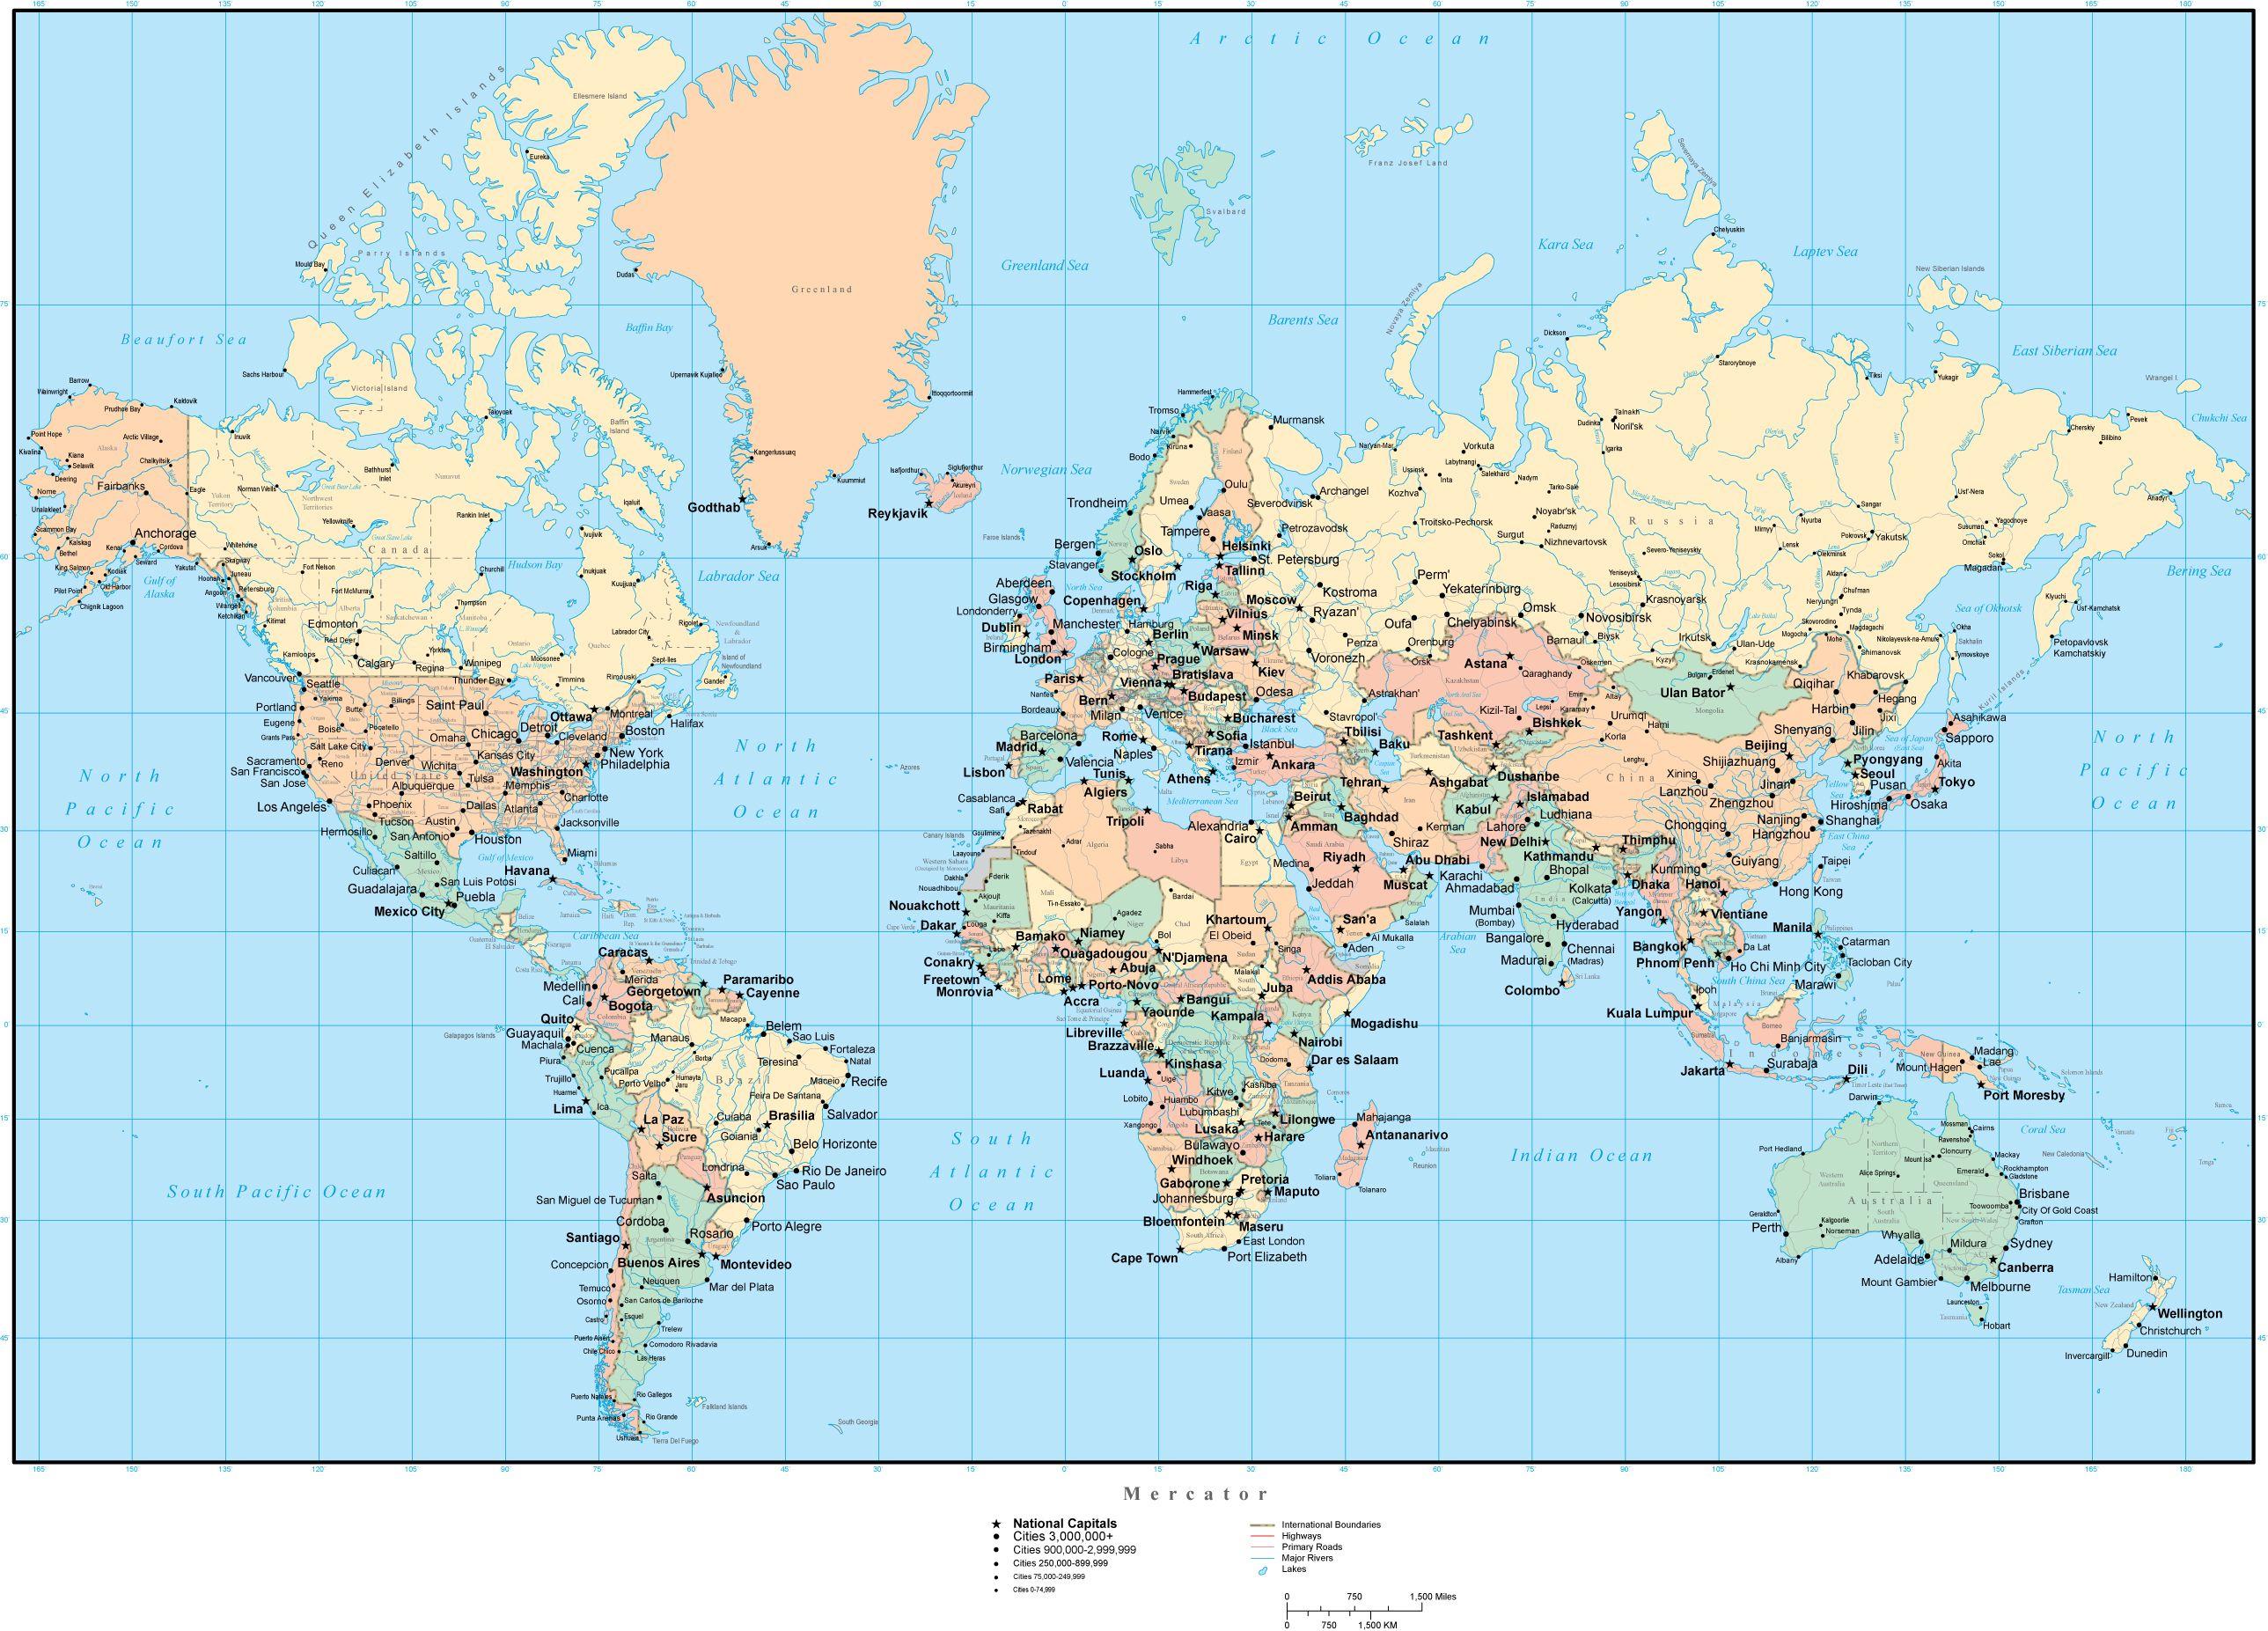 World Map In Or Adobe Illustrator Vector Format